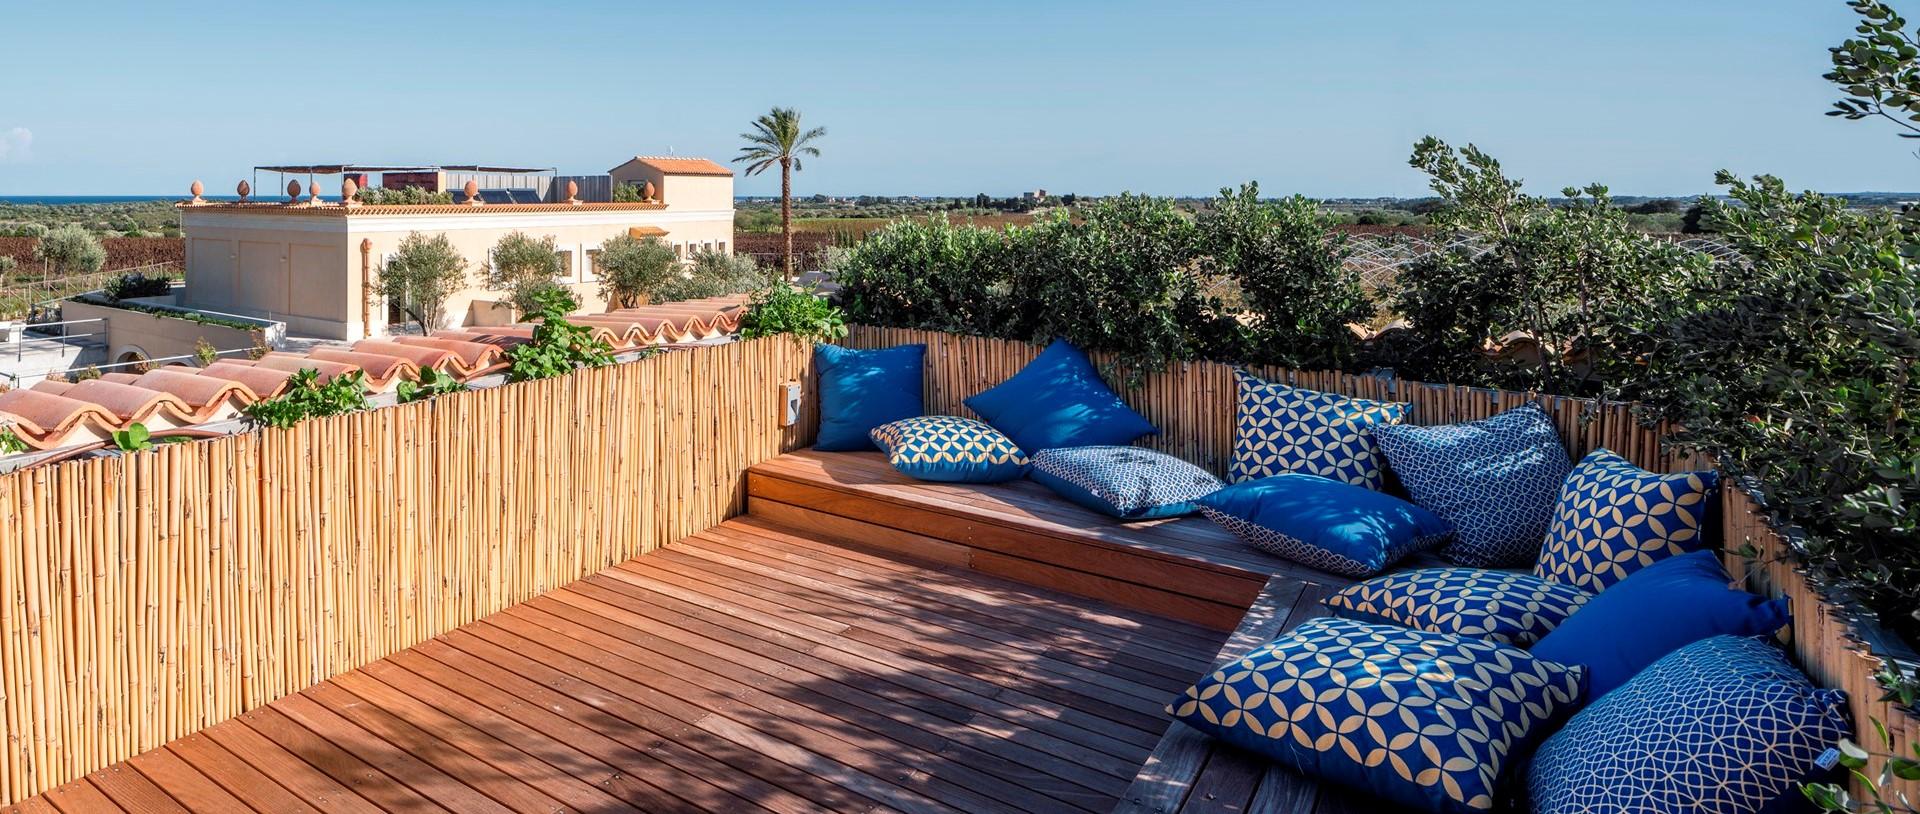 villa-annexe-roof-terrace